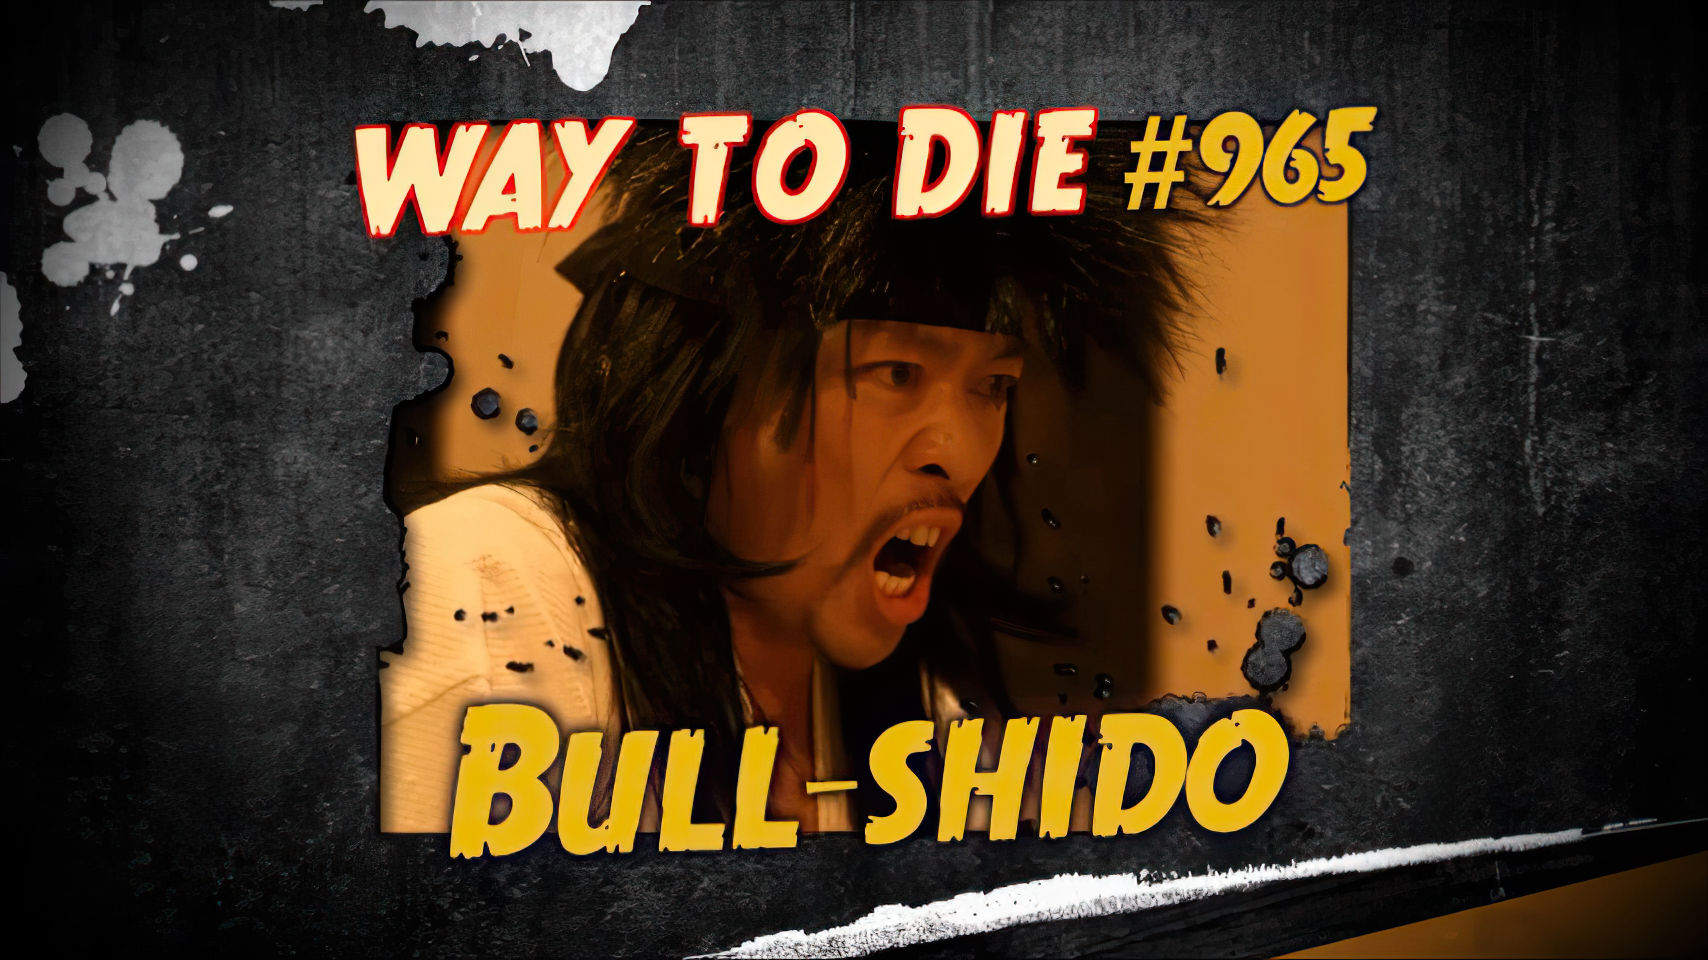 Bull-shido